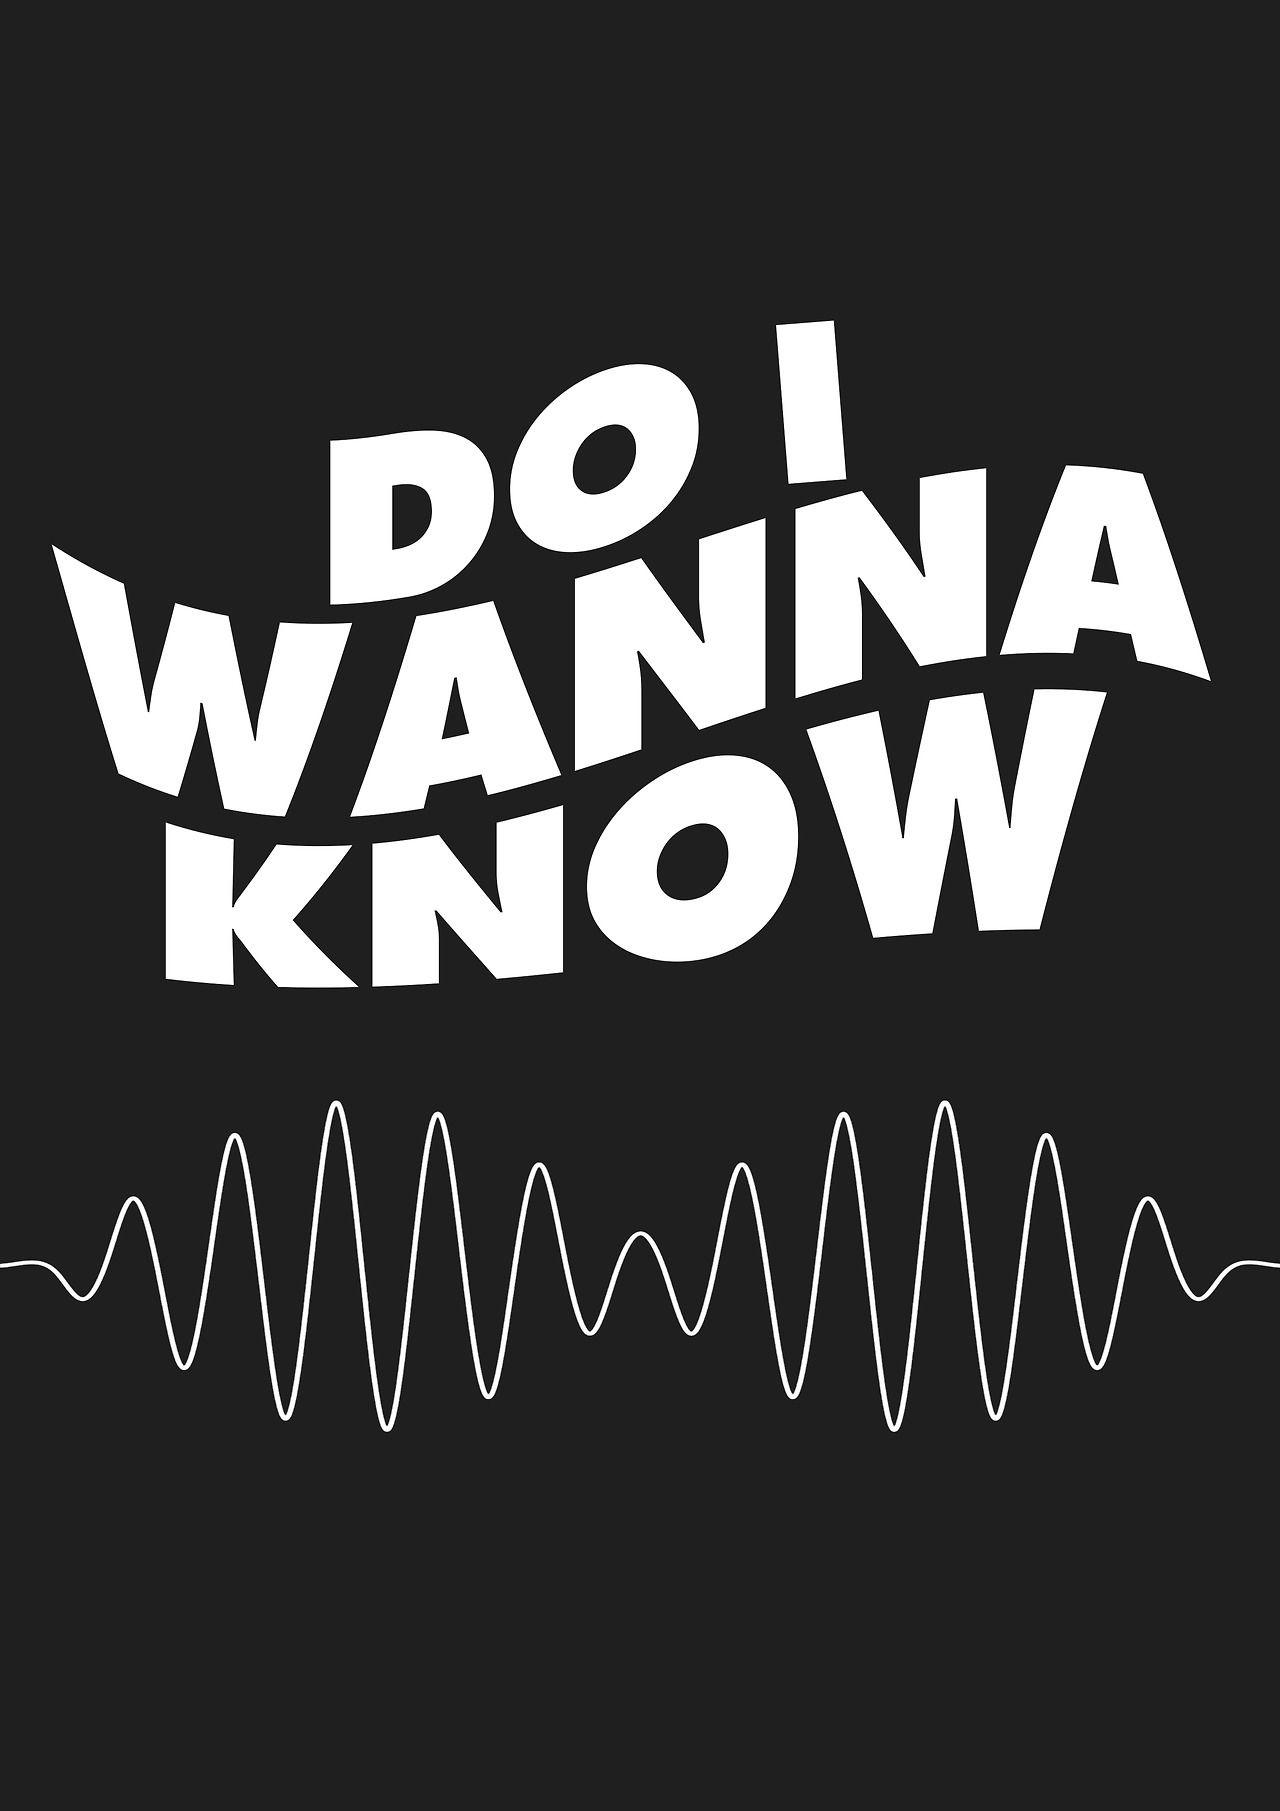 Do I Wanna Know Arctic Monkeys Arctic Monkeys Wallpaper Do I Wanna Know Arctic Monkeys